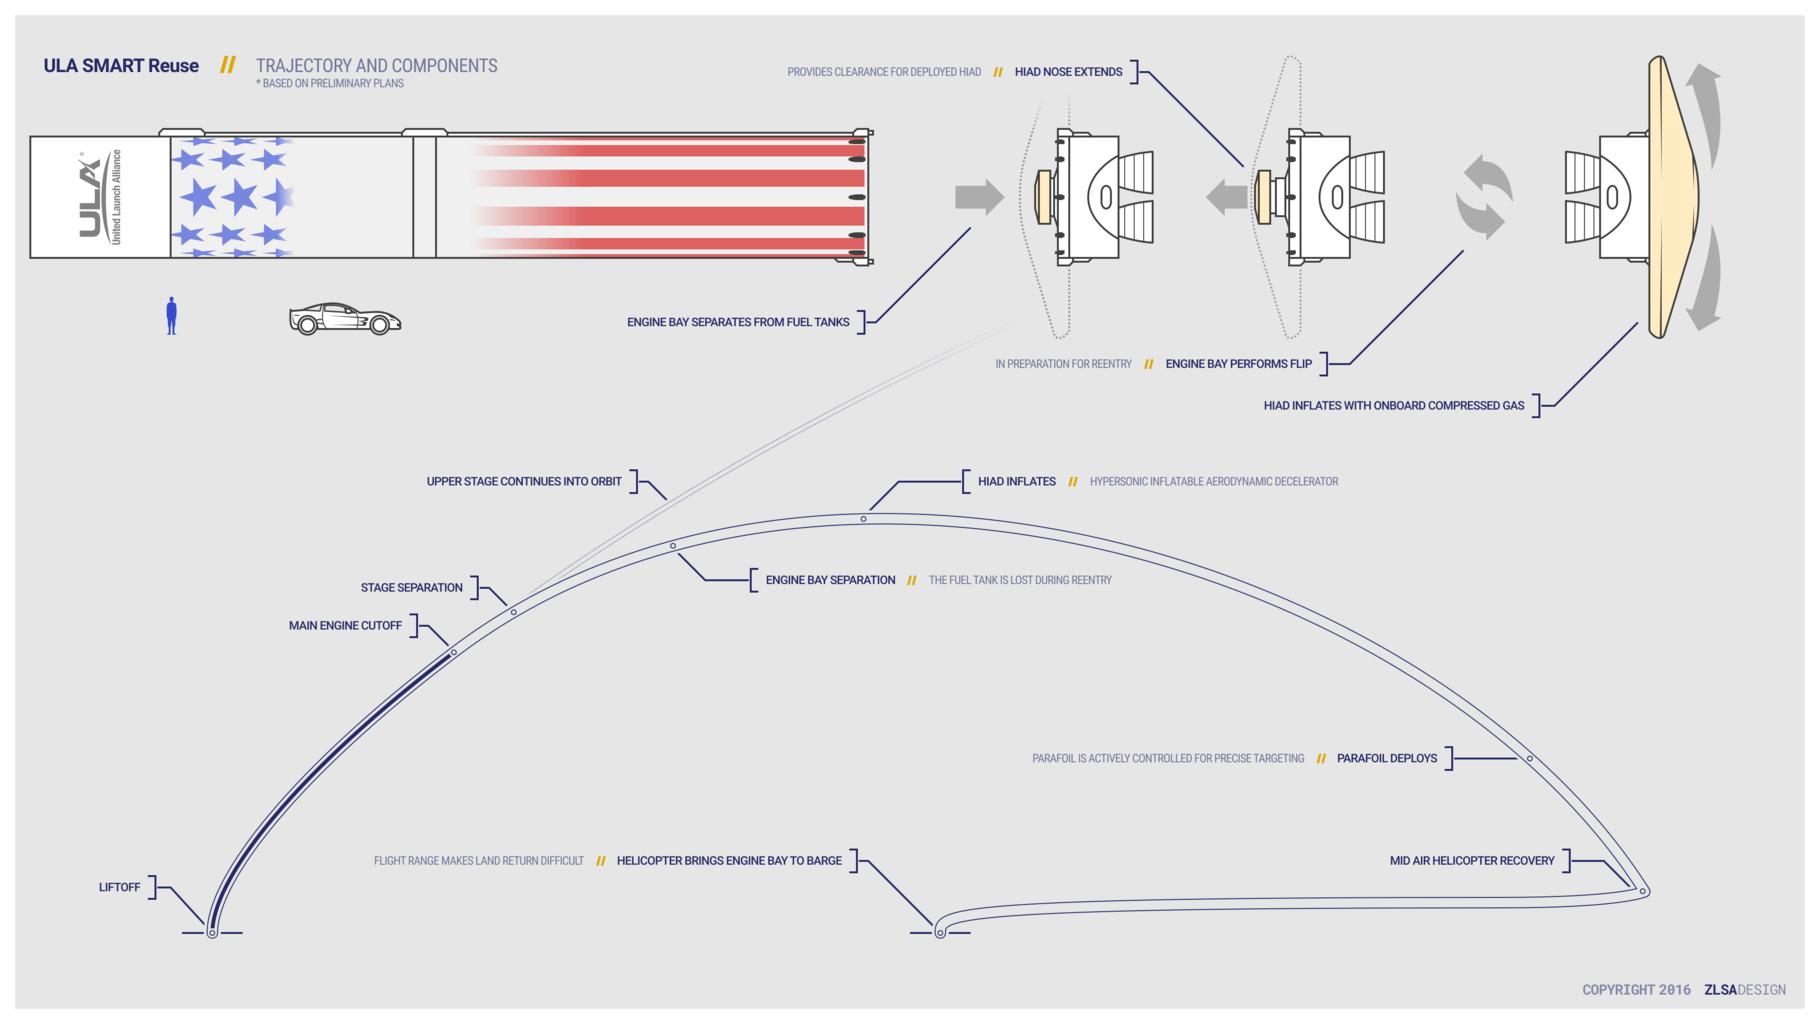 ULA SMART Reuse Trajectory and Components